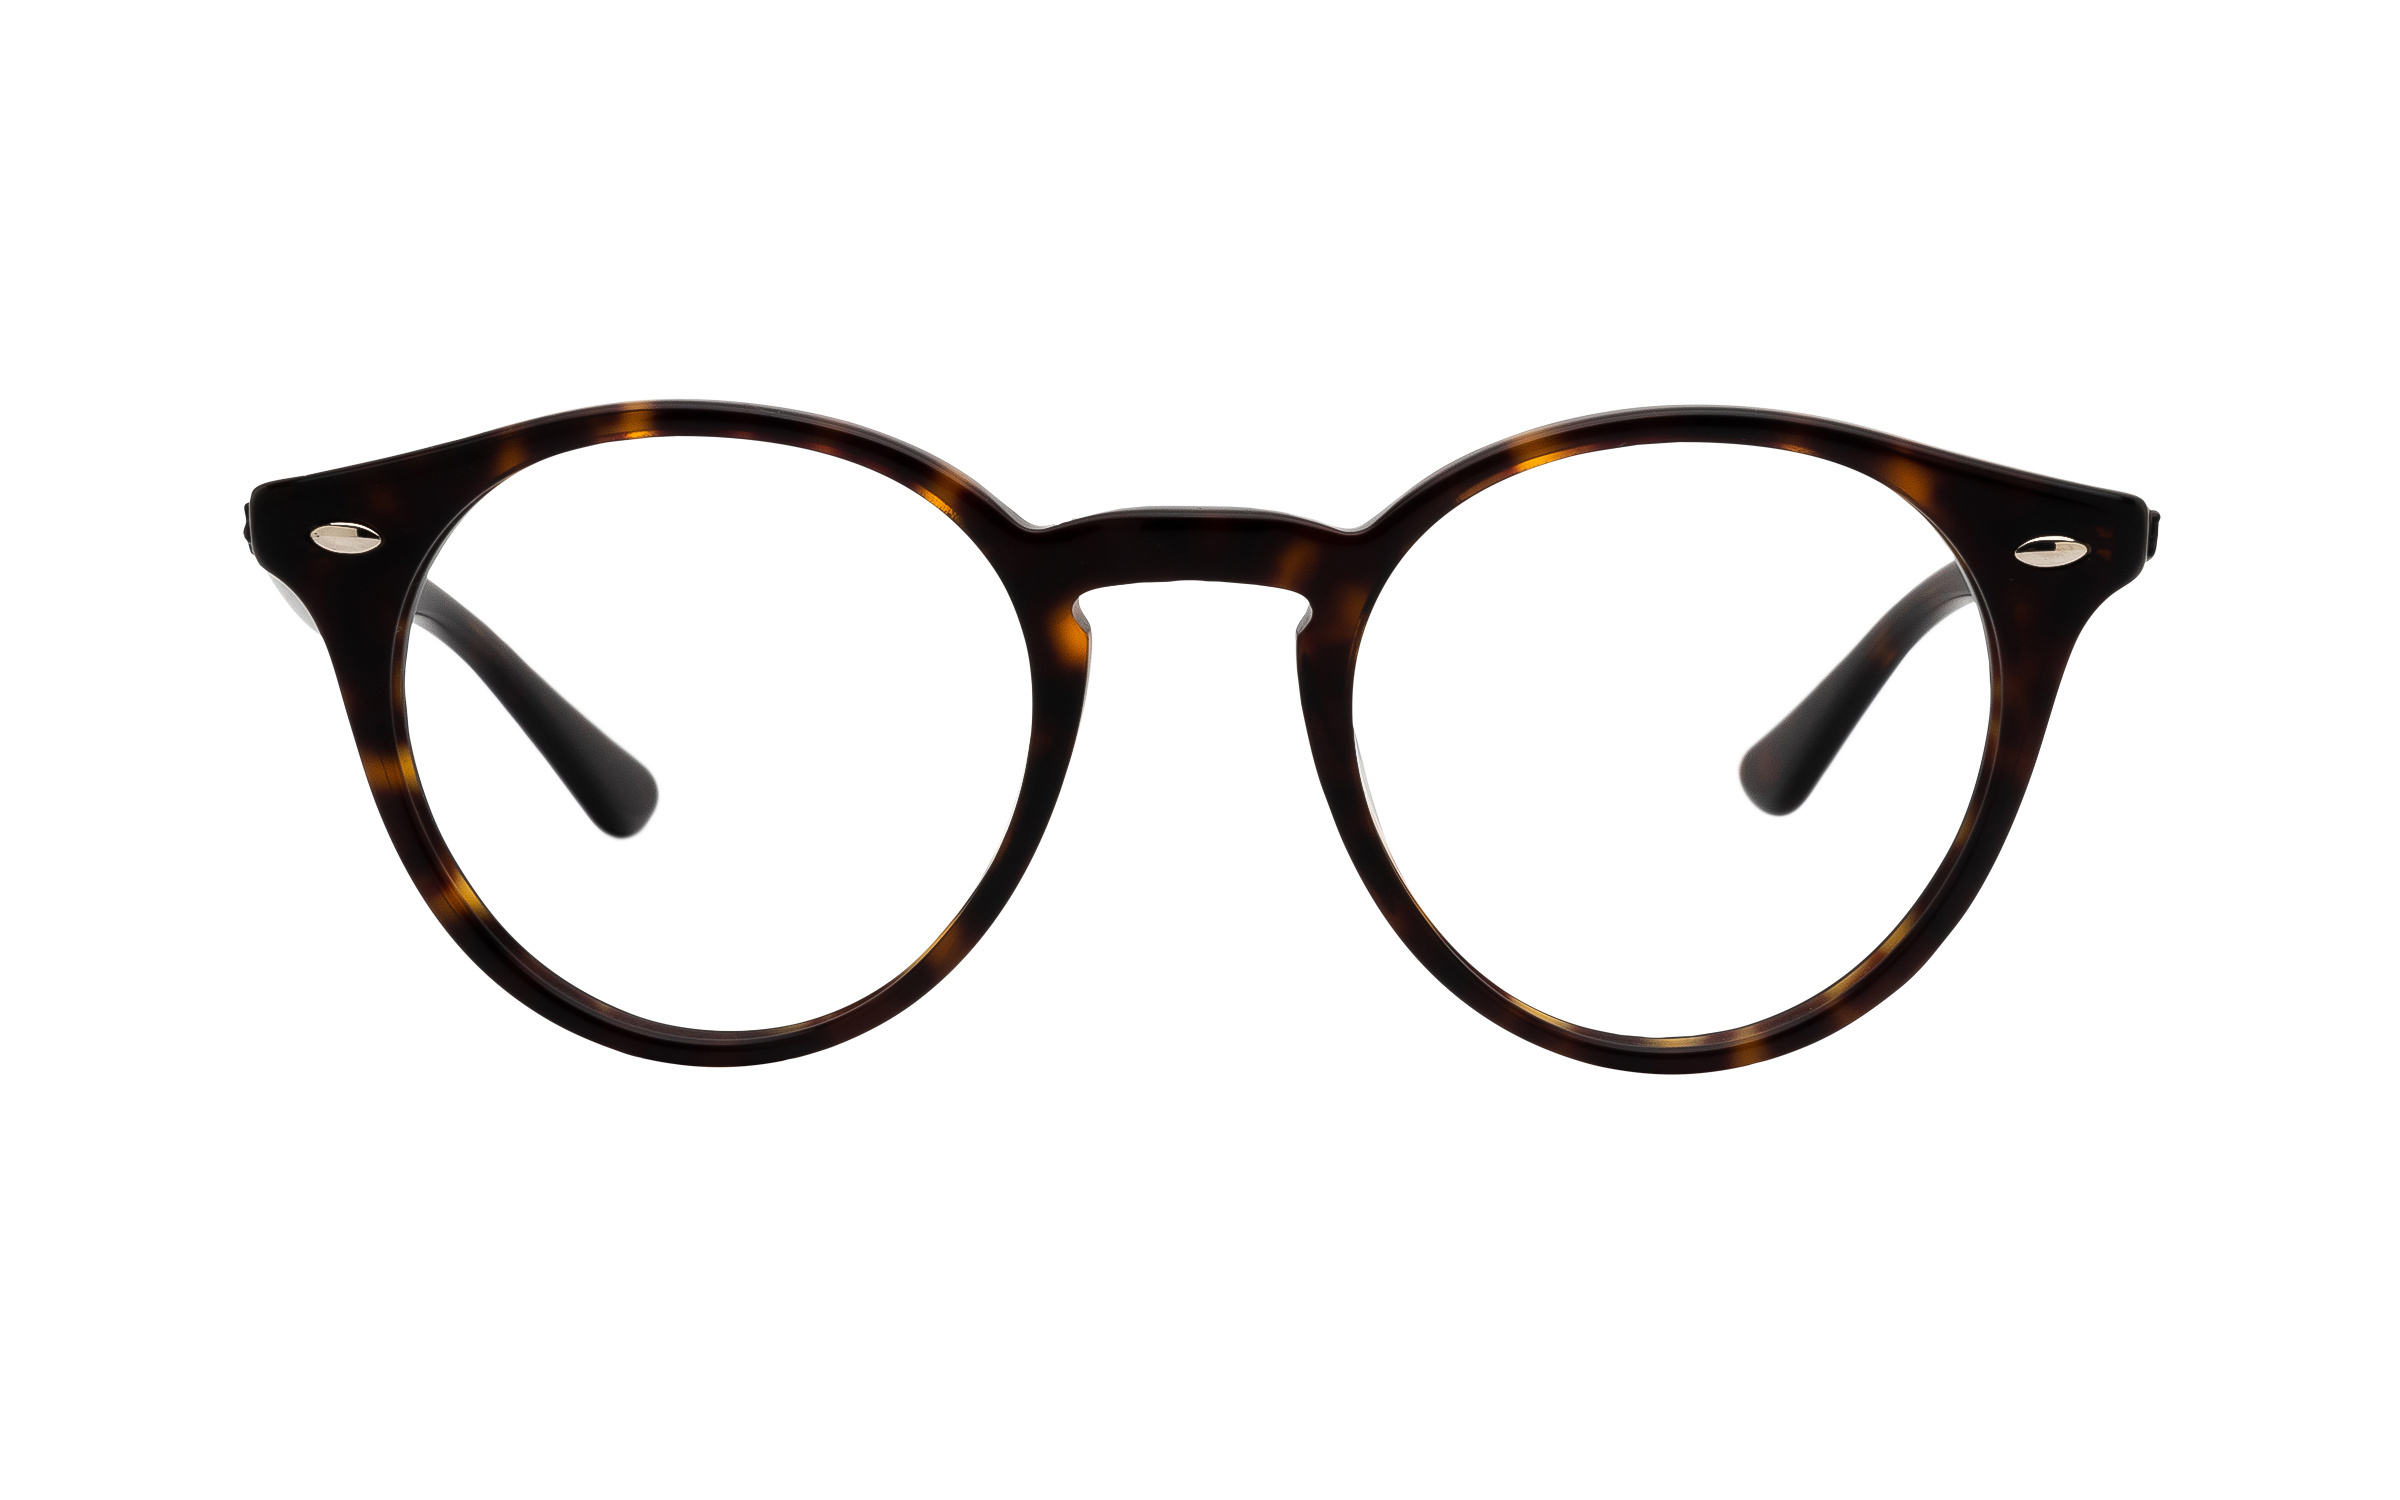 http://www.coastal.com/ - Ray-Ban RX2180V 2012 (47) Eyeglasses and Frame in Dark Havana Tortoise/Brown | Acetate/Metal – Online Coastal